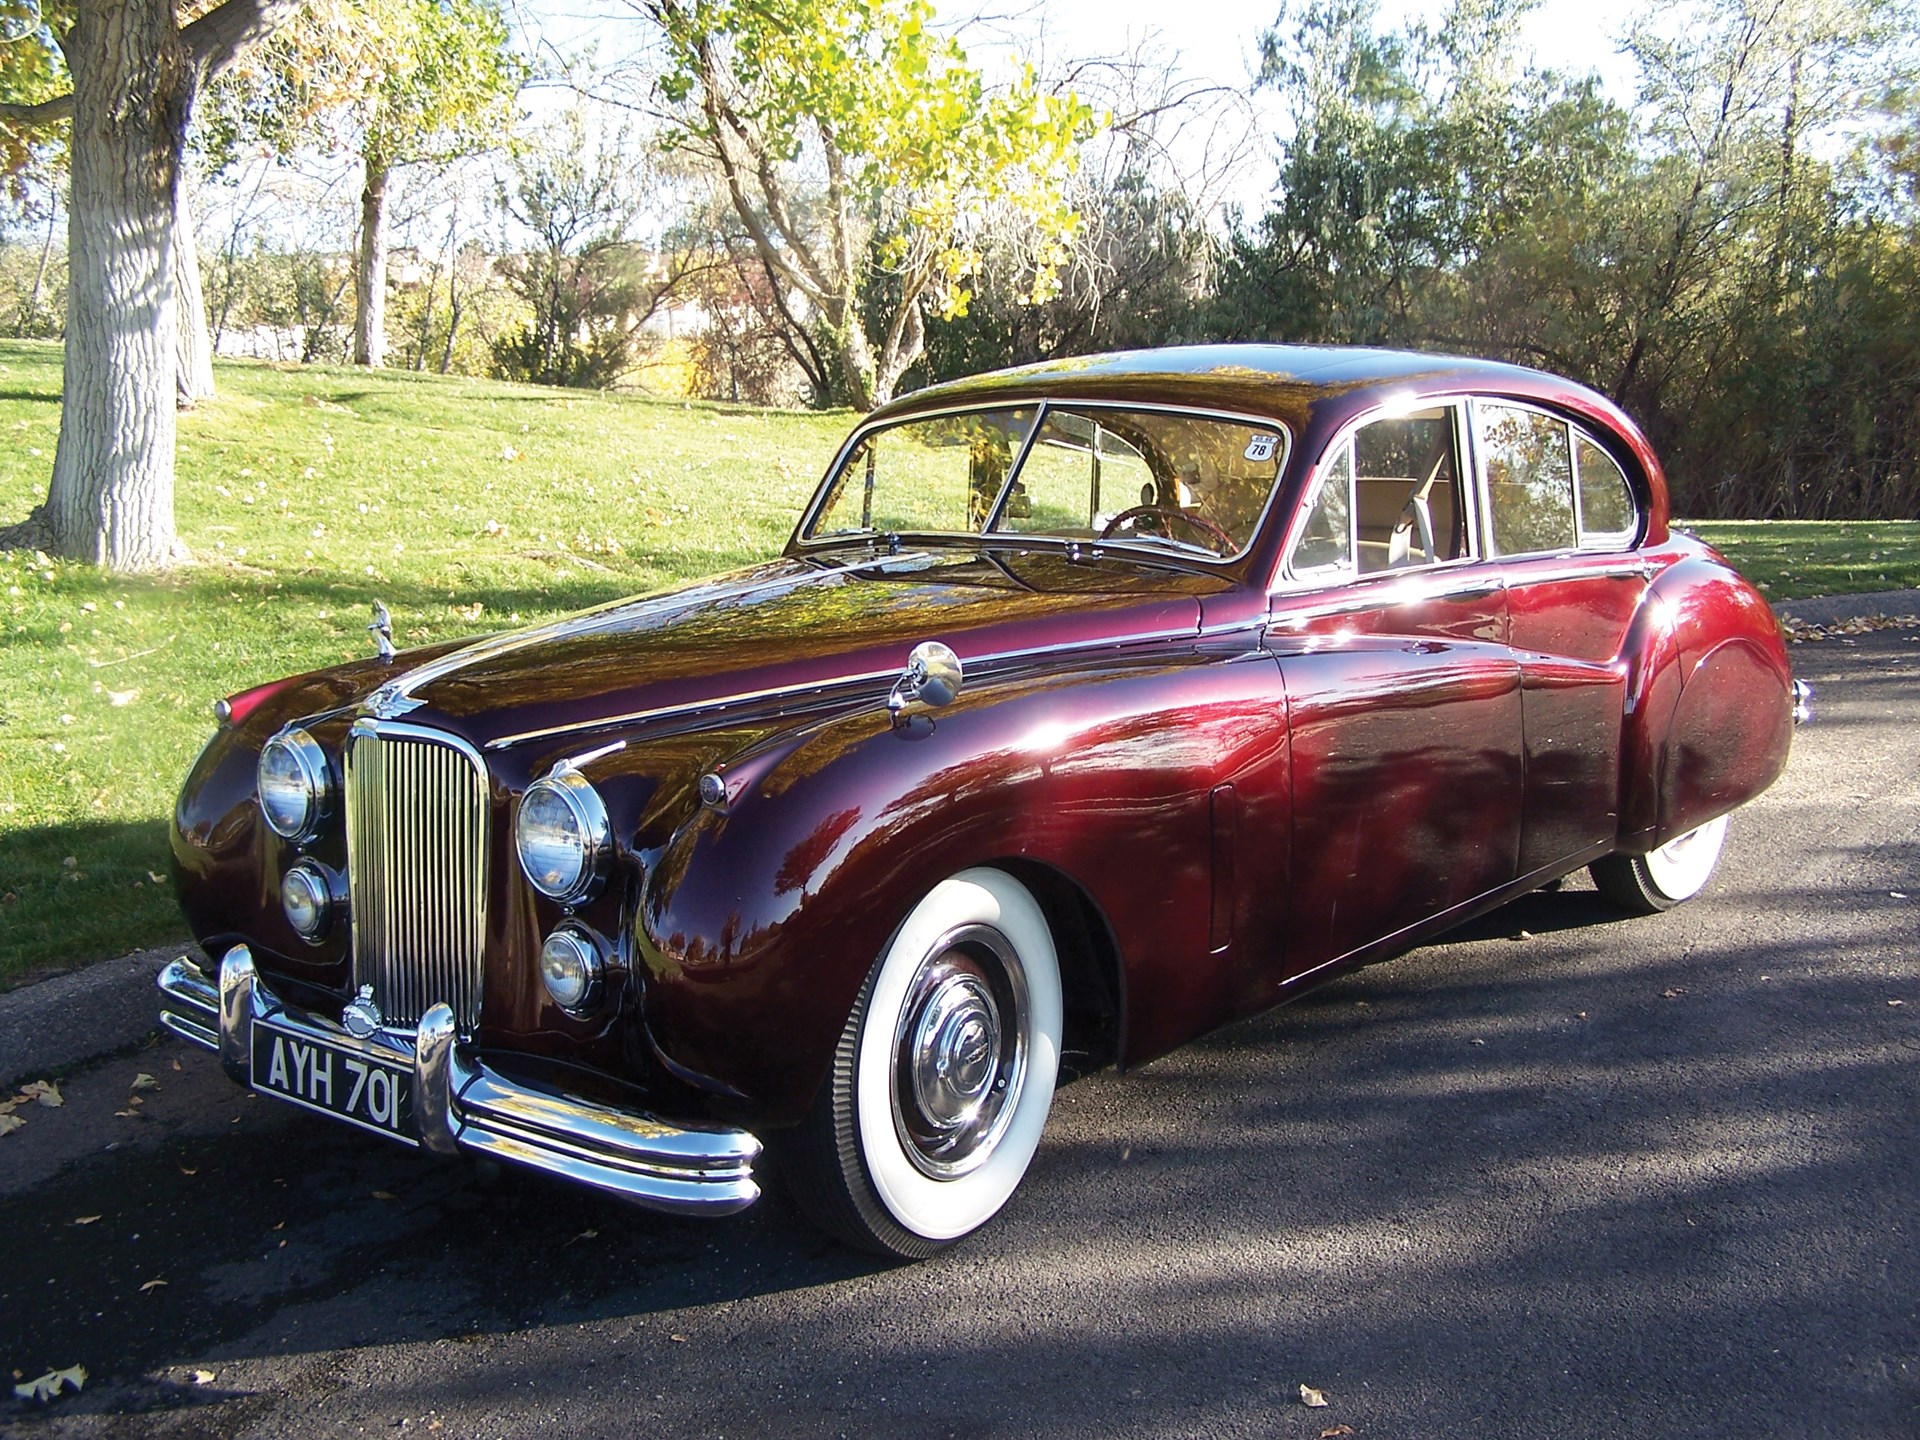 RM Sotheby's - 1953 Jaguar Mark VII   Automobiles of Arizona 2010